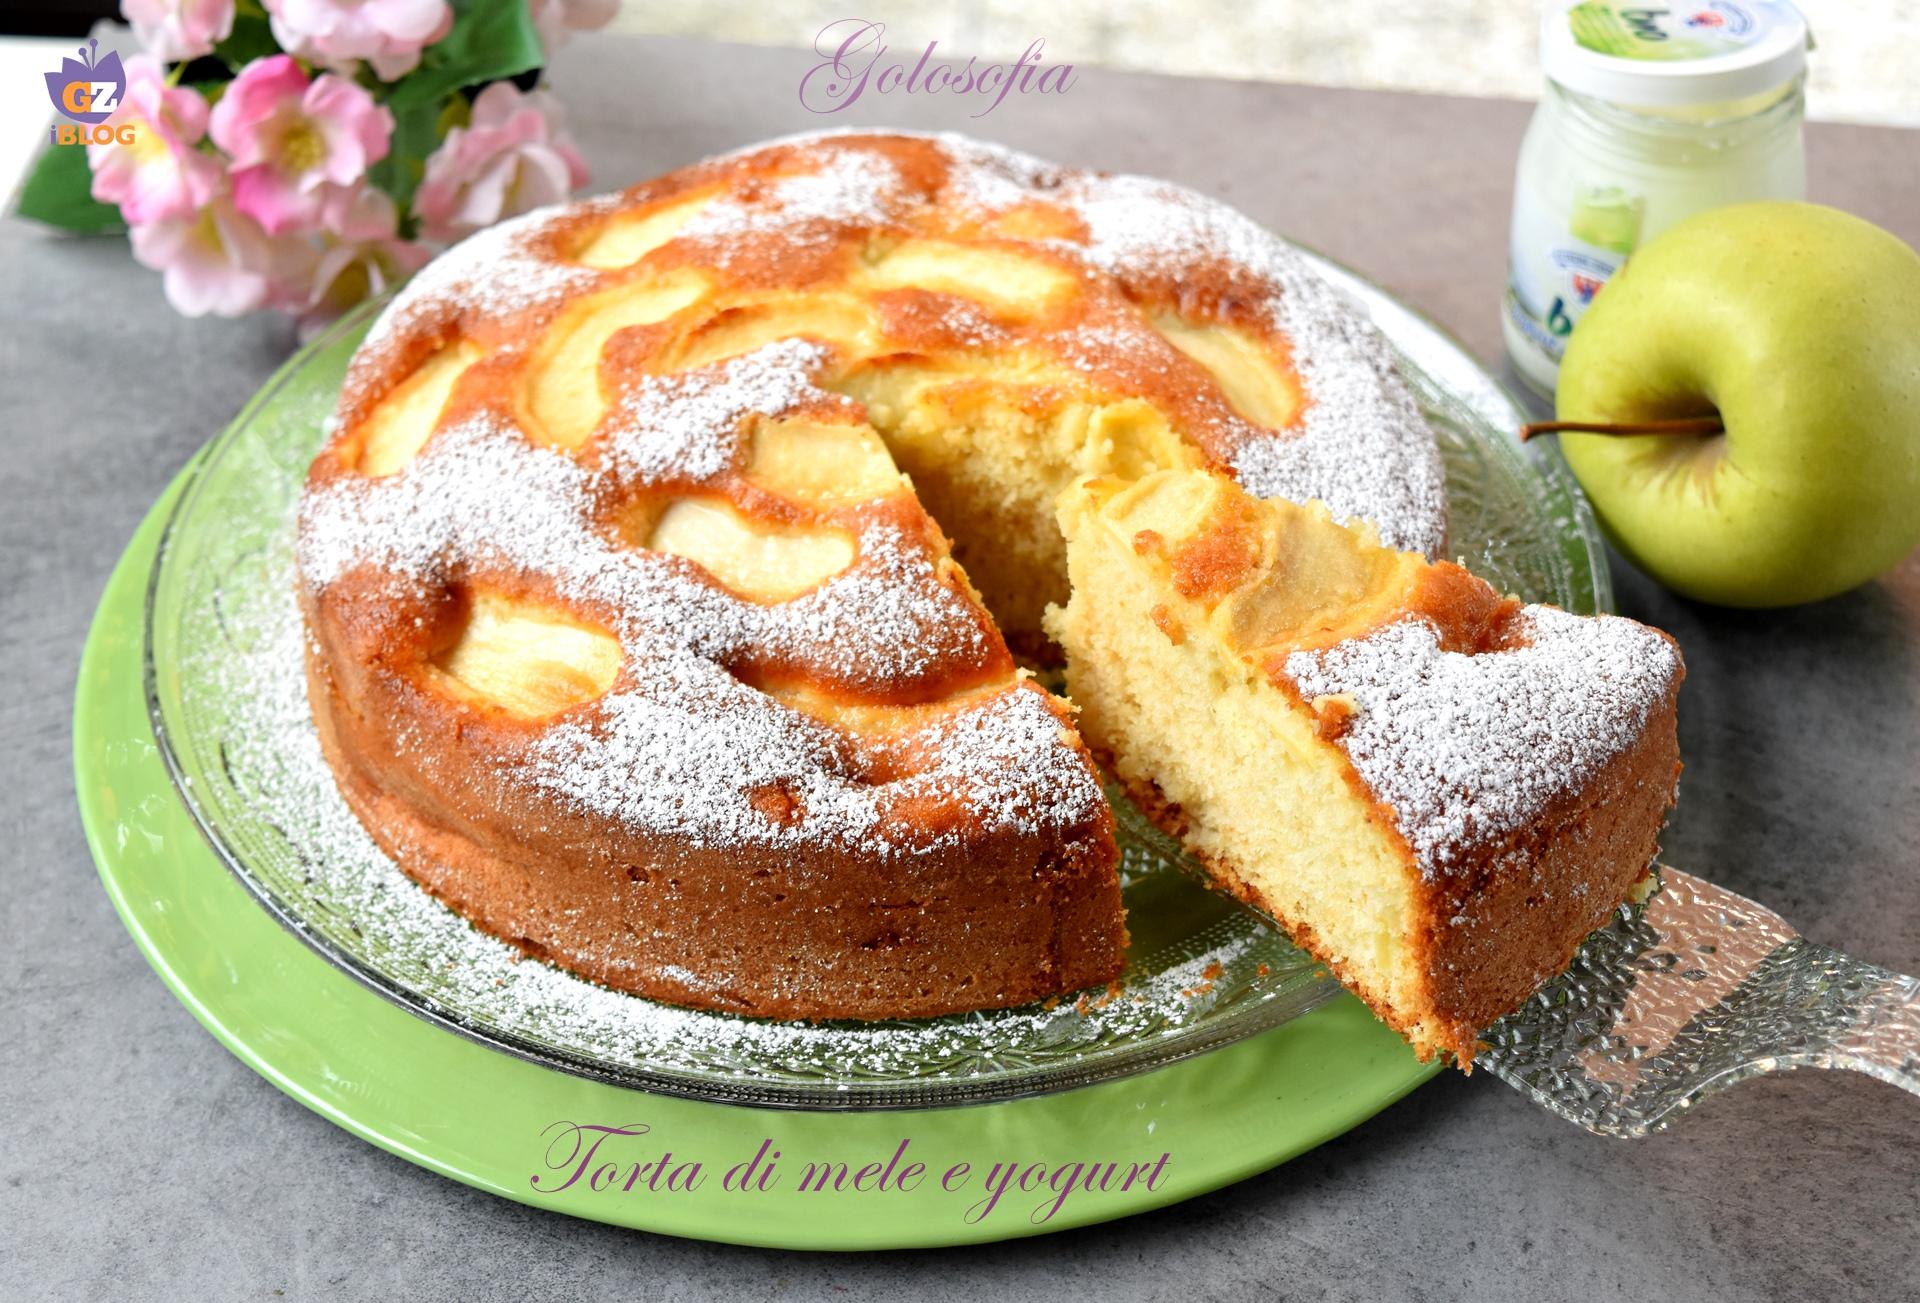 Torta di mele e yogurt-ricetta torte-golosofia